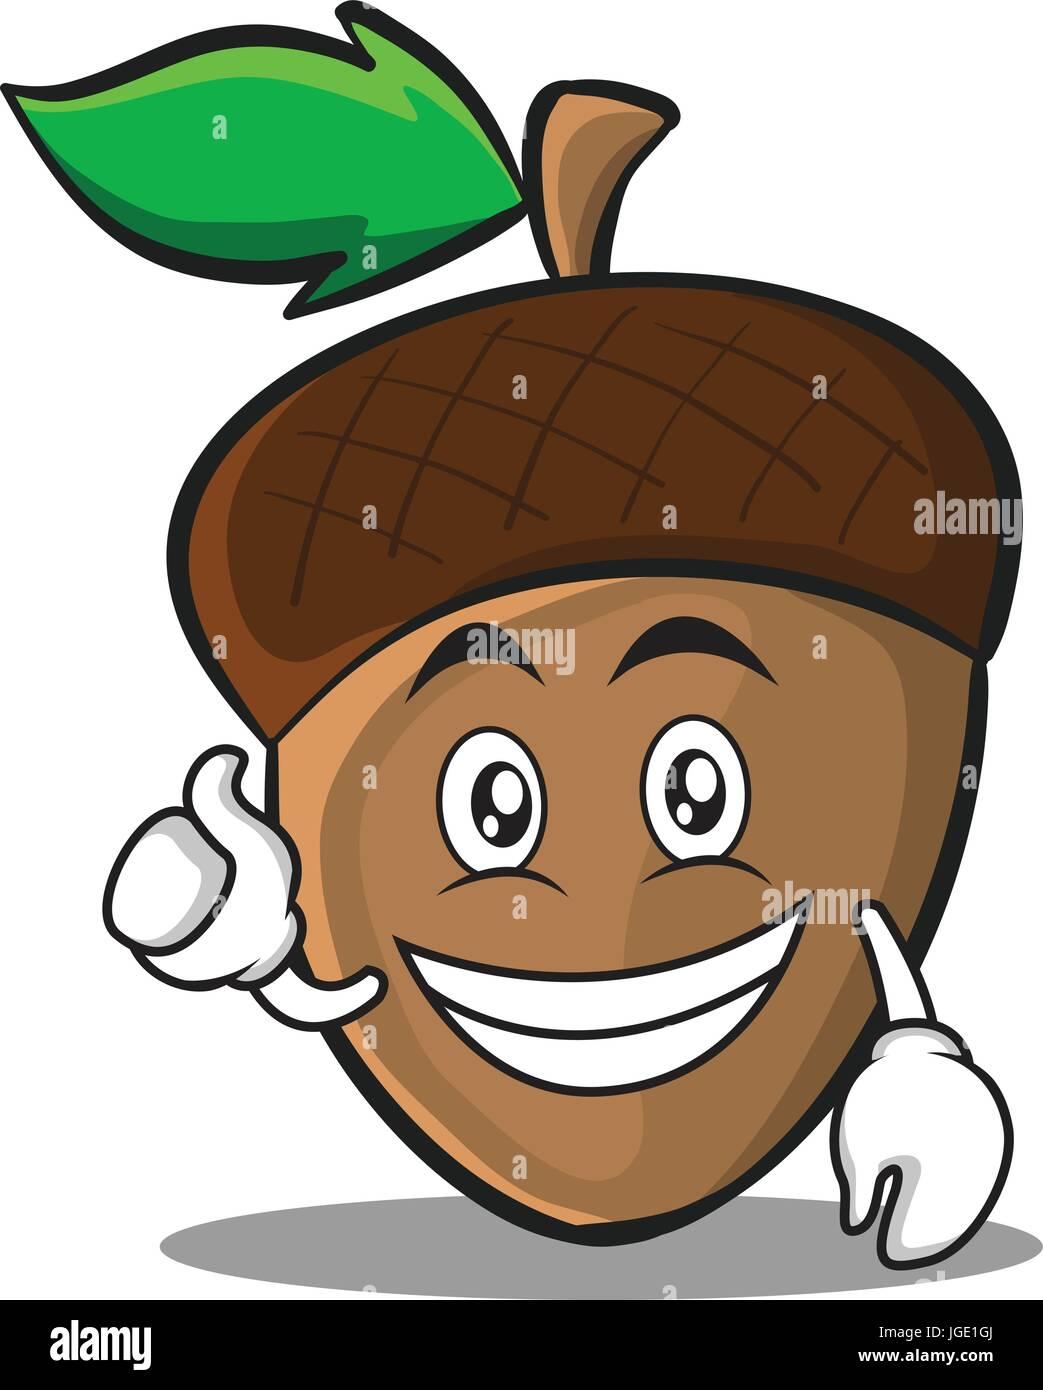 Style de caractère de dessin animé acorn optimistes Photo Stock